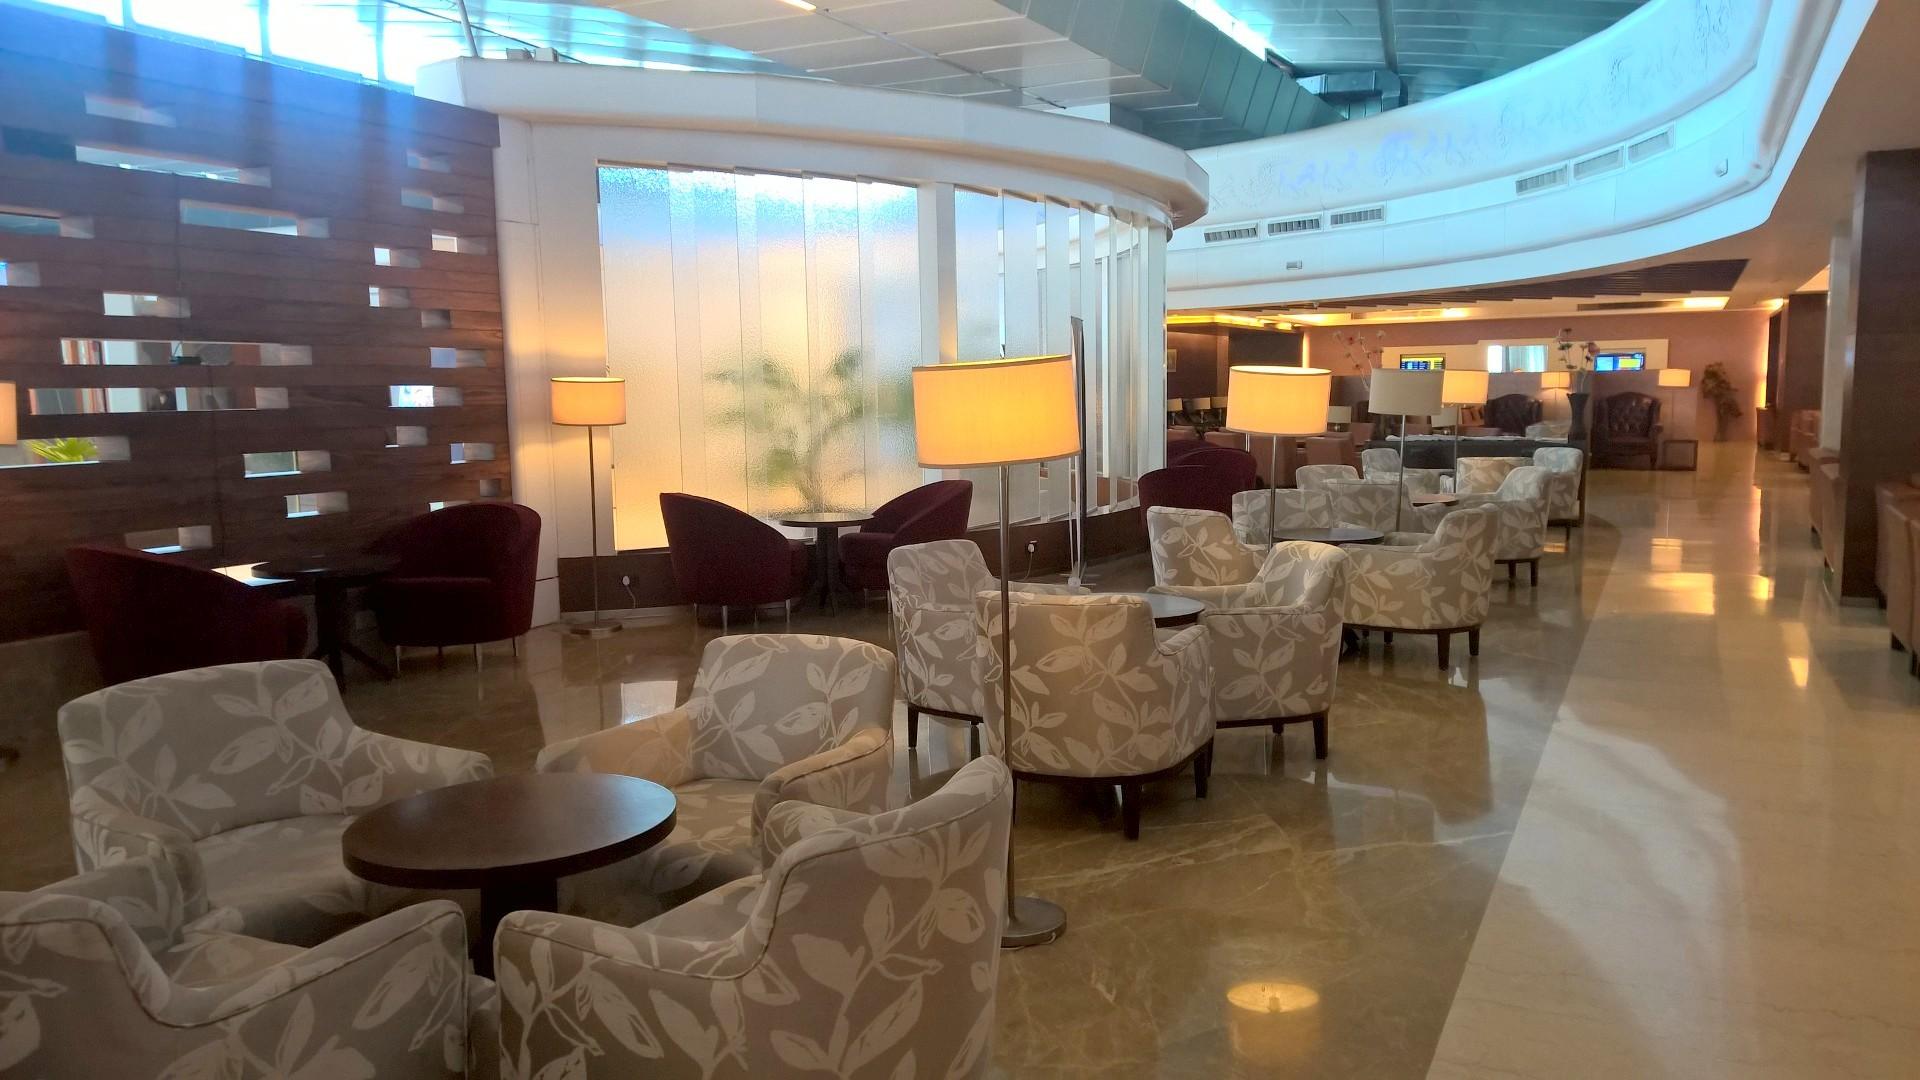 Air India Lounge Delhi Seating